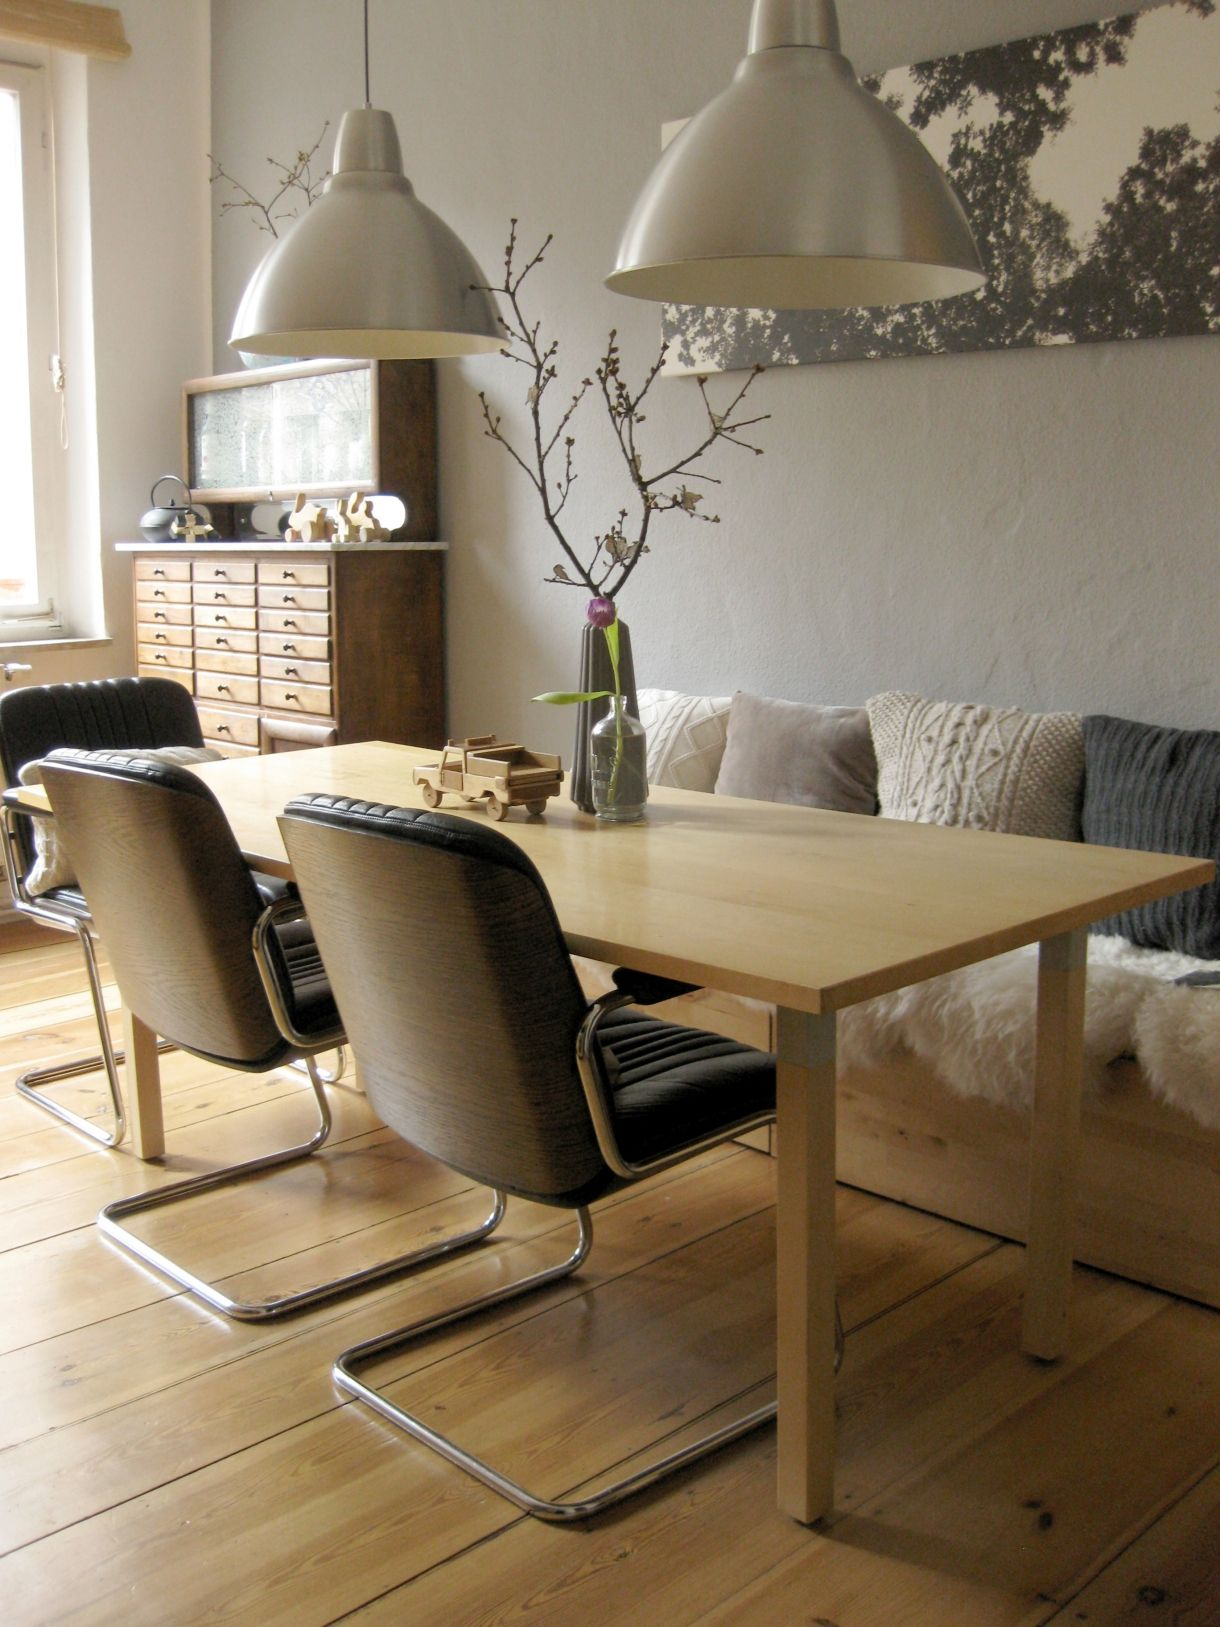 korbst hle f r esszimmer hausgestaltung ideen. Black Bedroom Furniture Sets. Home Design Ideas